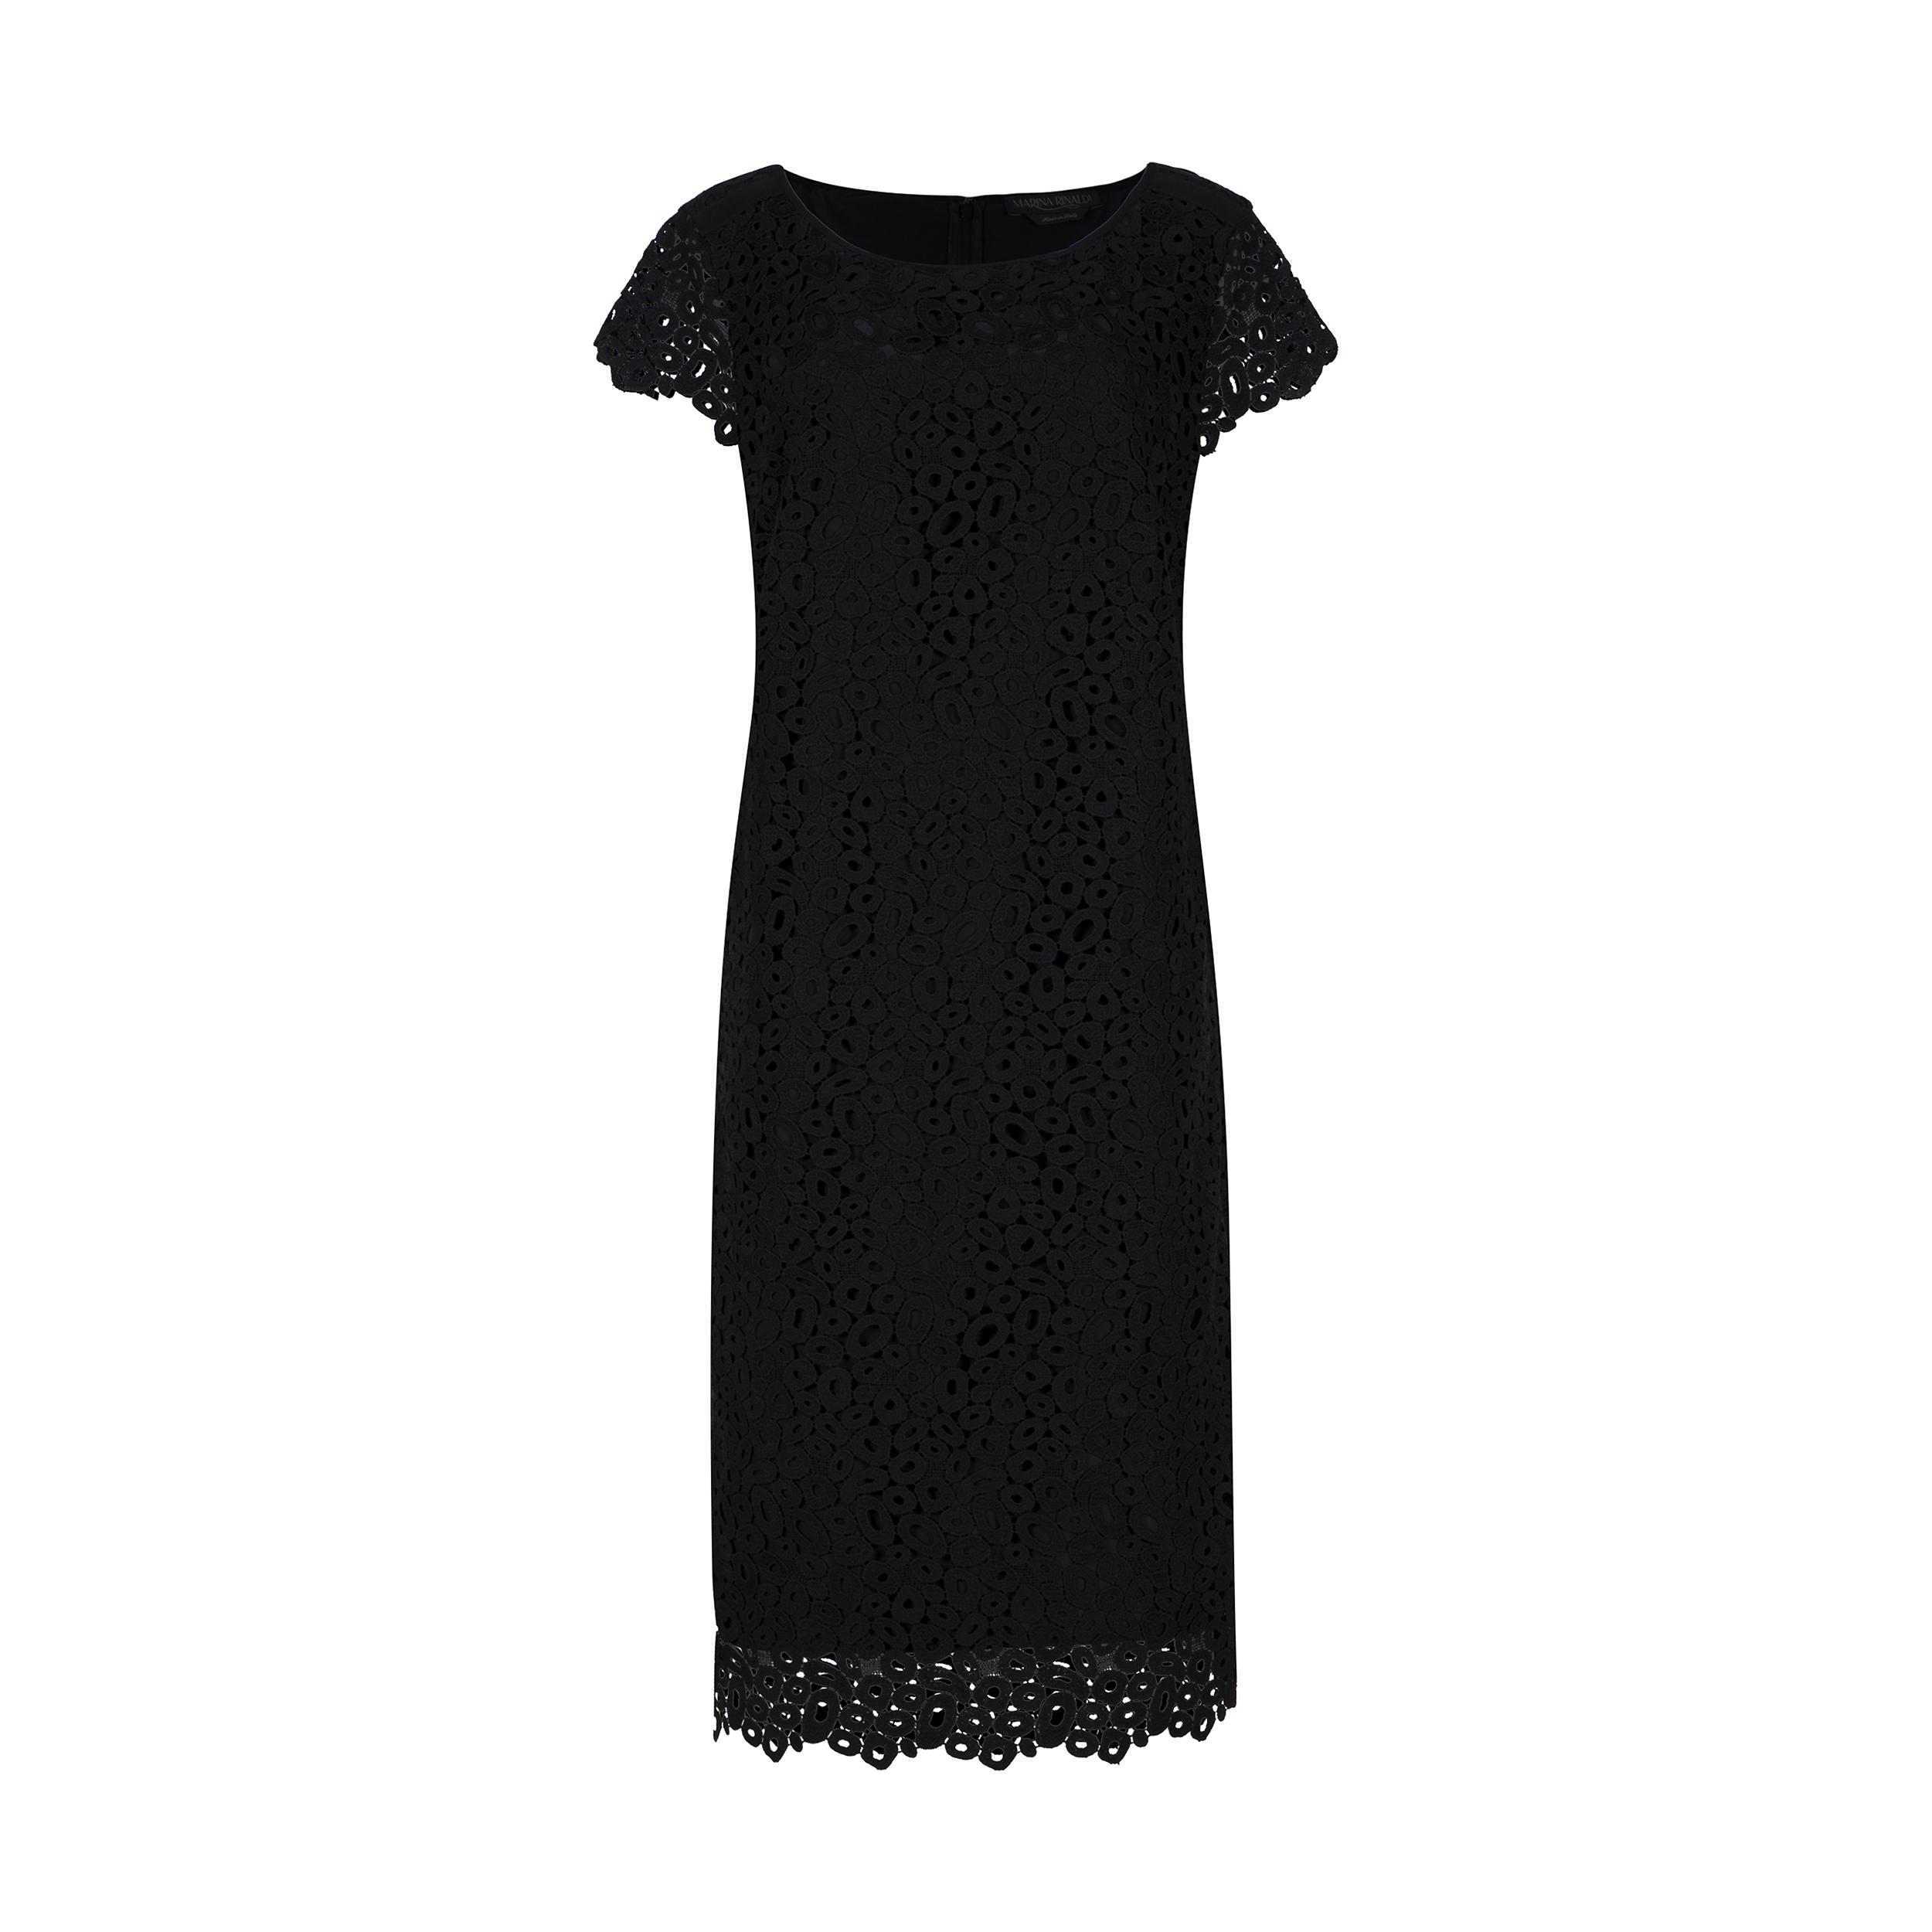 پیراهن زنانه مارینا رینالدی مدل 42211780040744